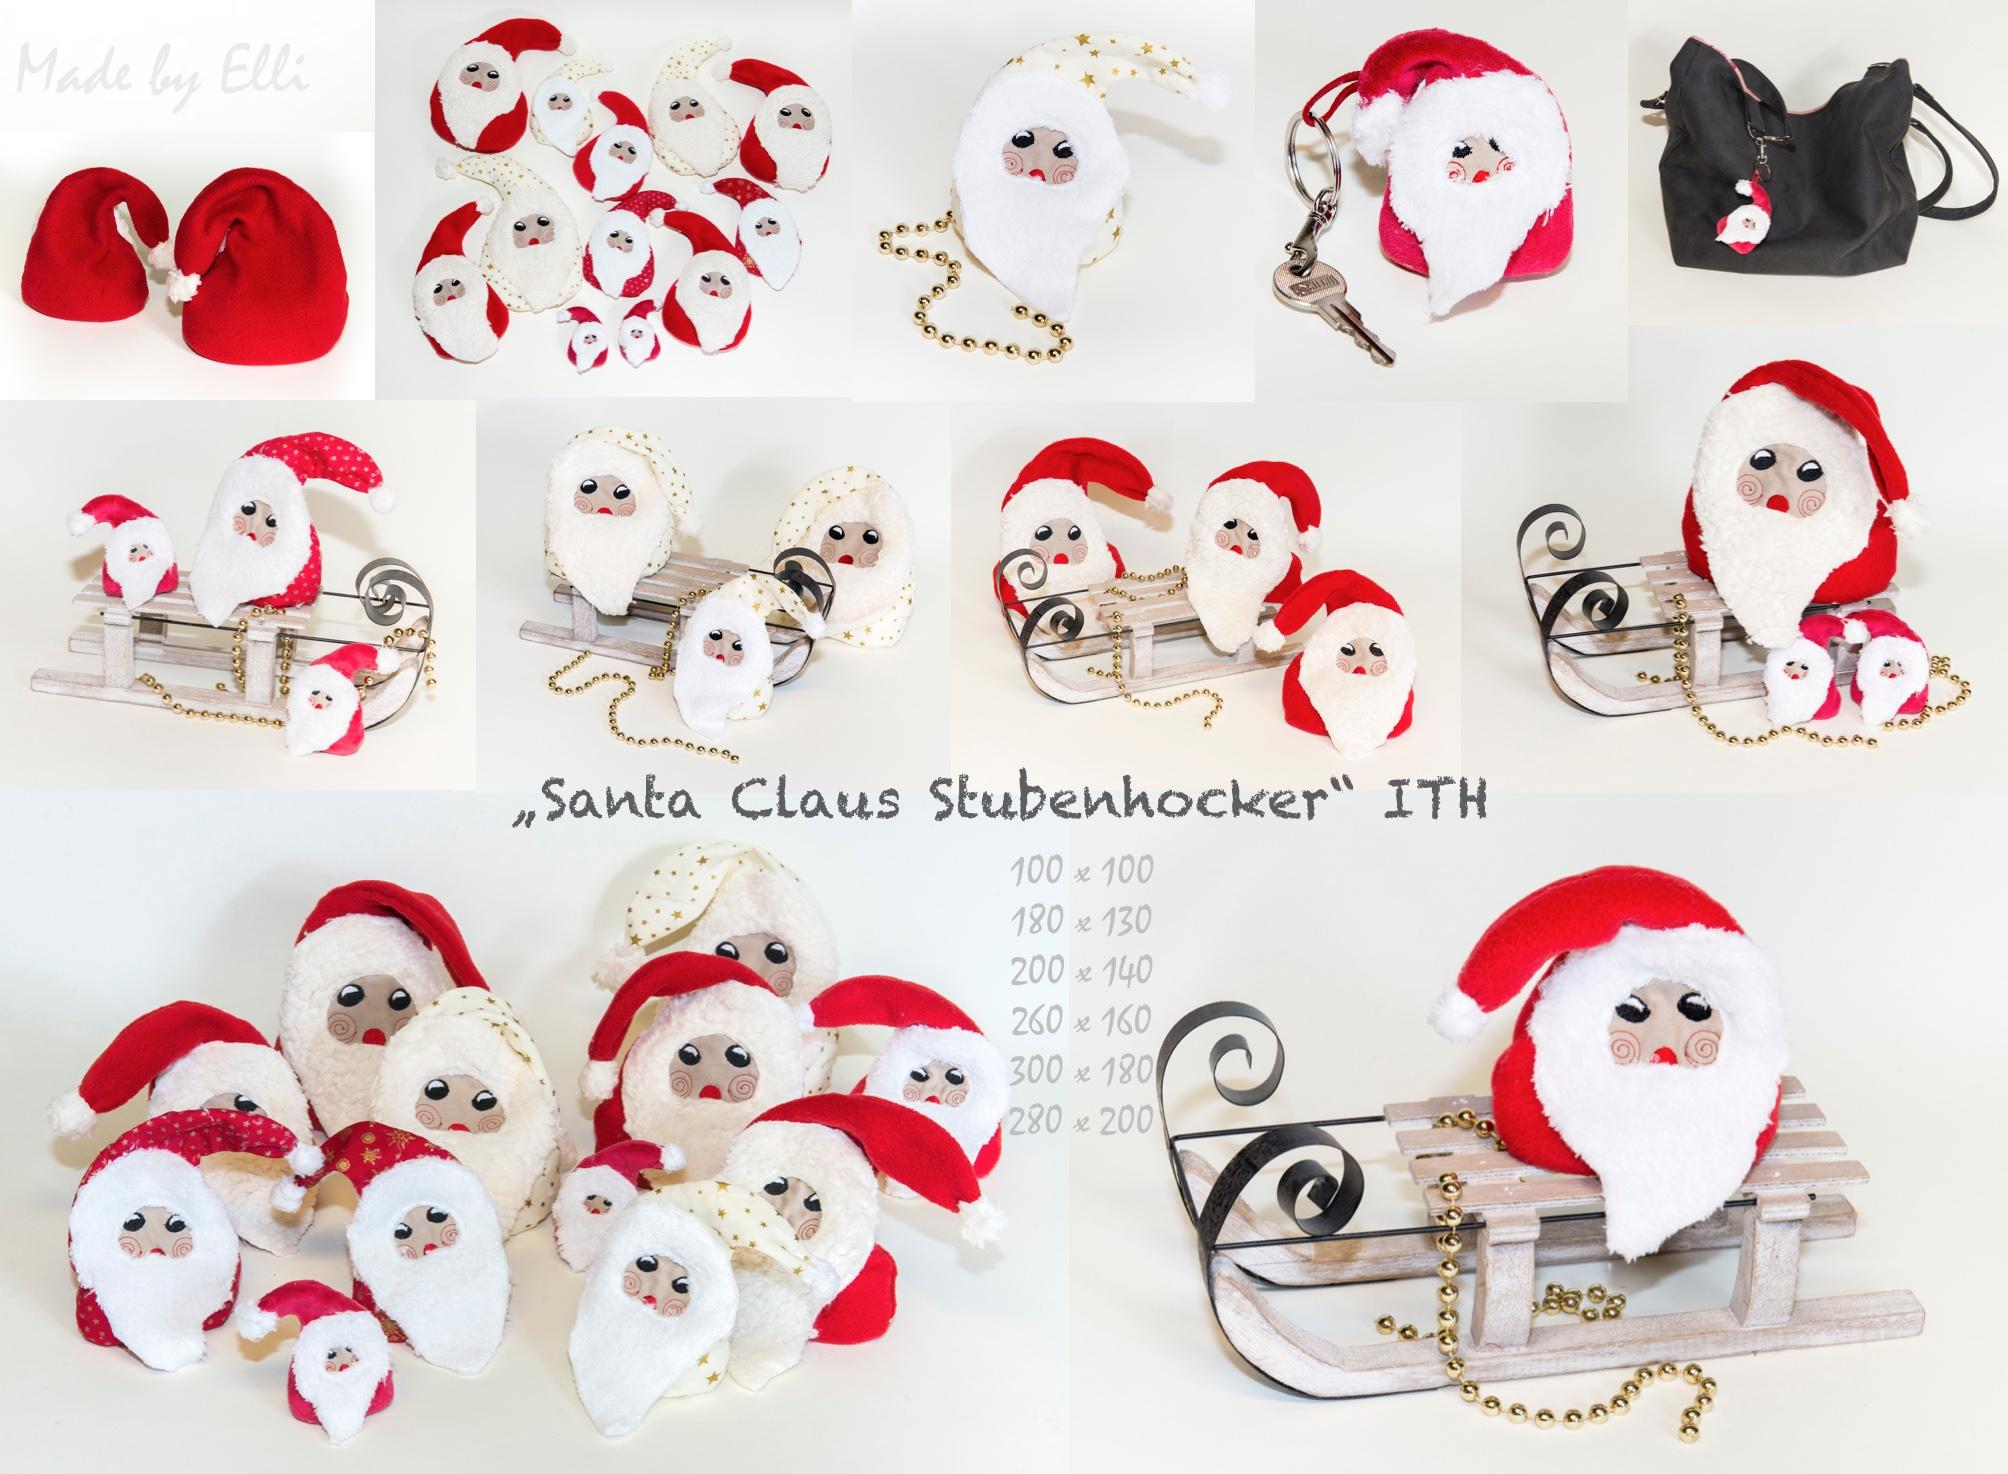 Santa Claus Stubenhocker ITH - Elli